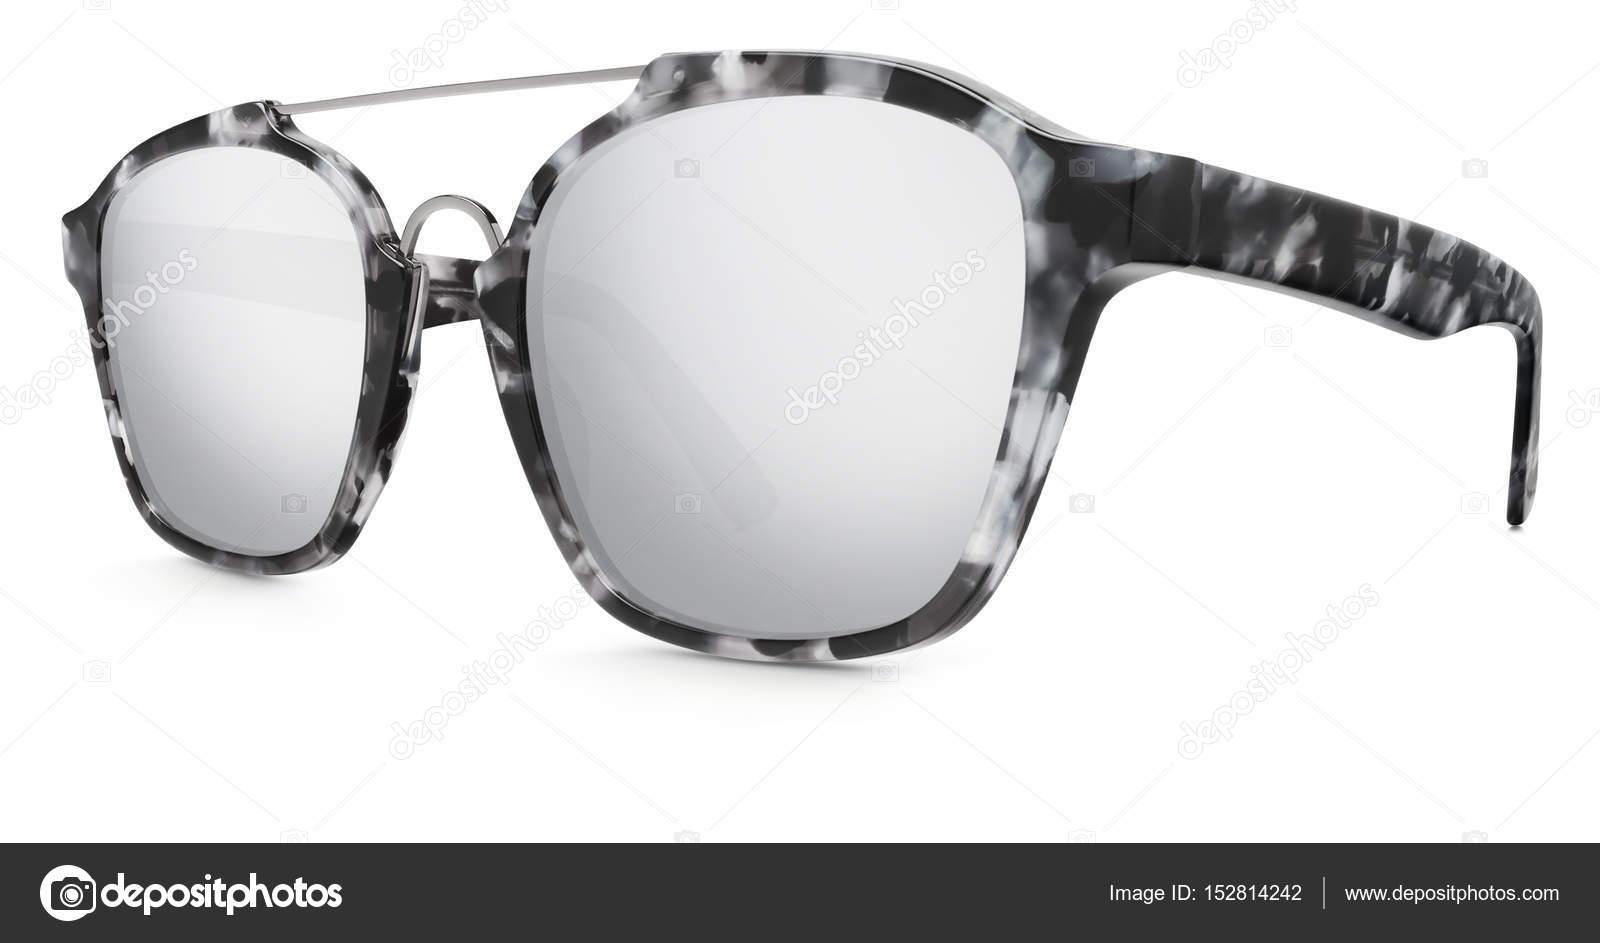 abfb53d351 Καθρέφτης στίγματα γυαλιά ηλίου γκρι φακοί απομονωθεί σε λευκό φόντο —  Εικόνα από amedeoemaja